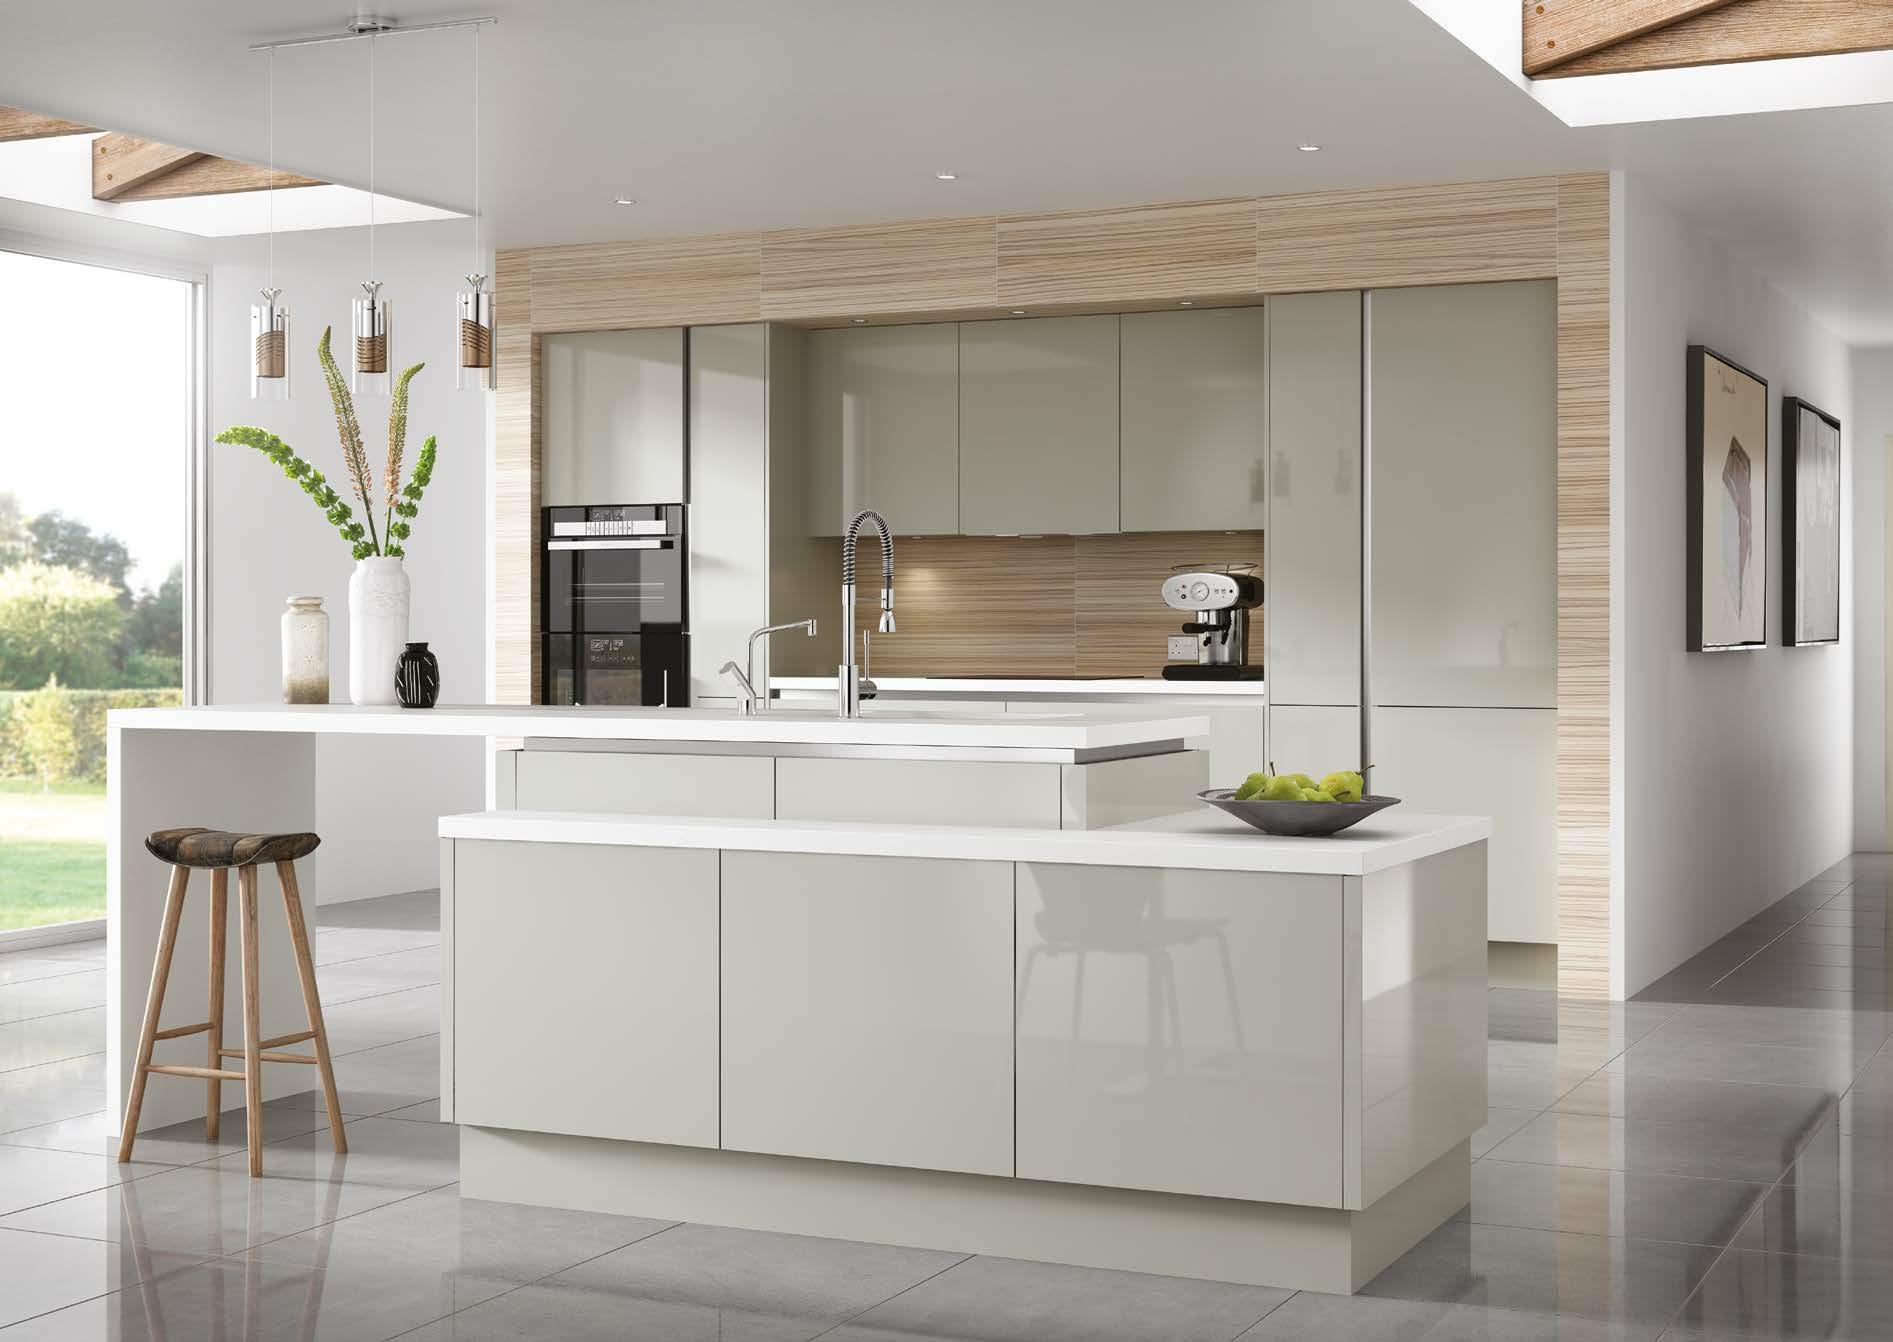 True Grey Gloss Handleless Kitchen Design By Sheraton Interiors! Browse  Sheraton Interiors For Kitchen Ideas